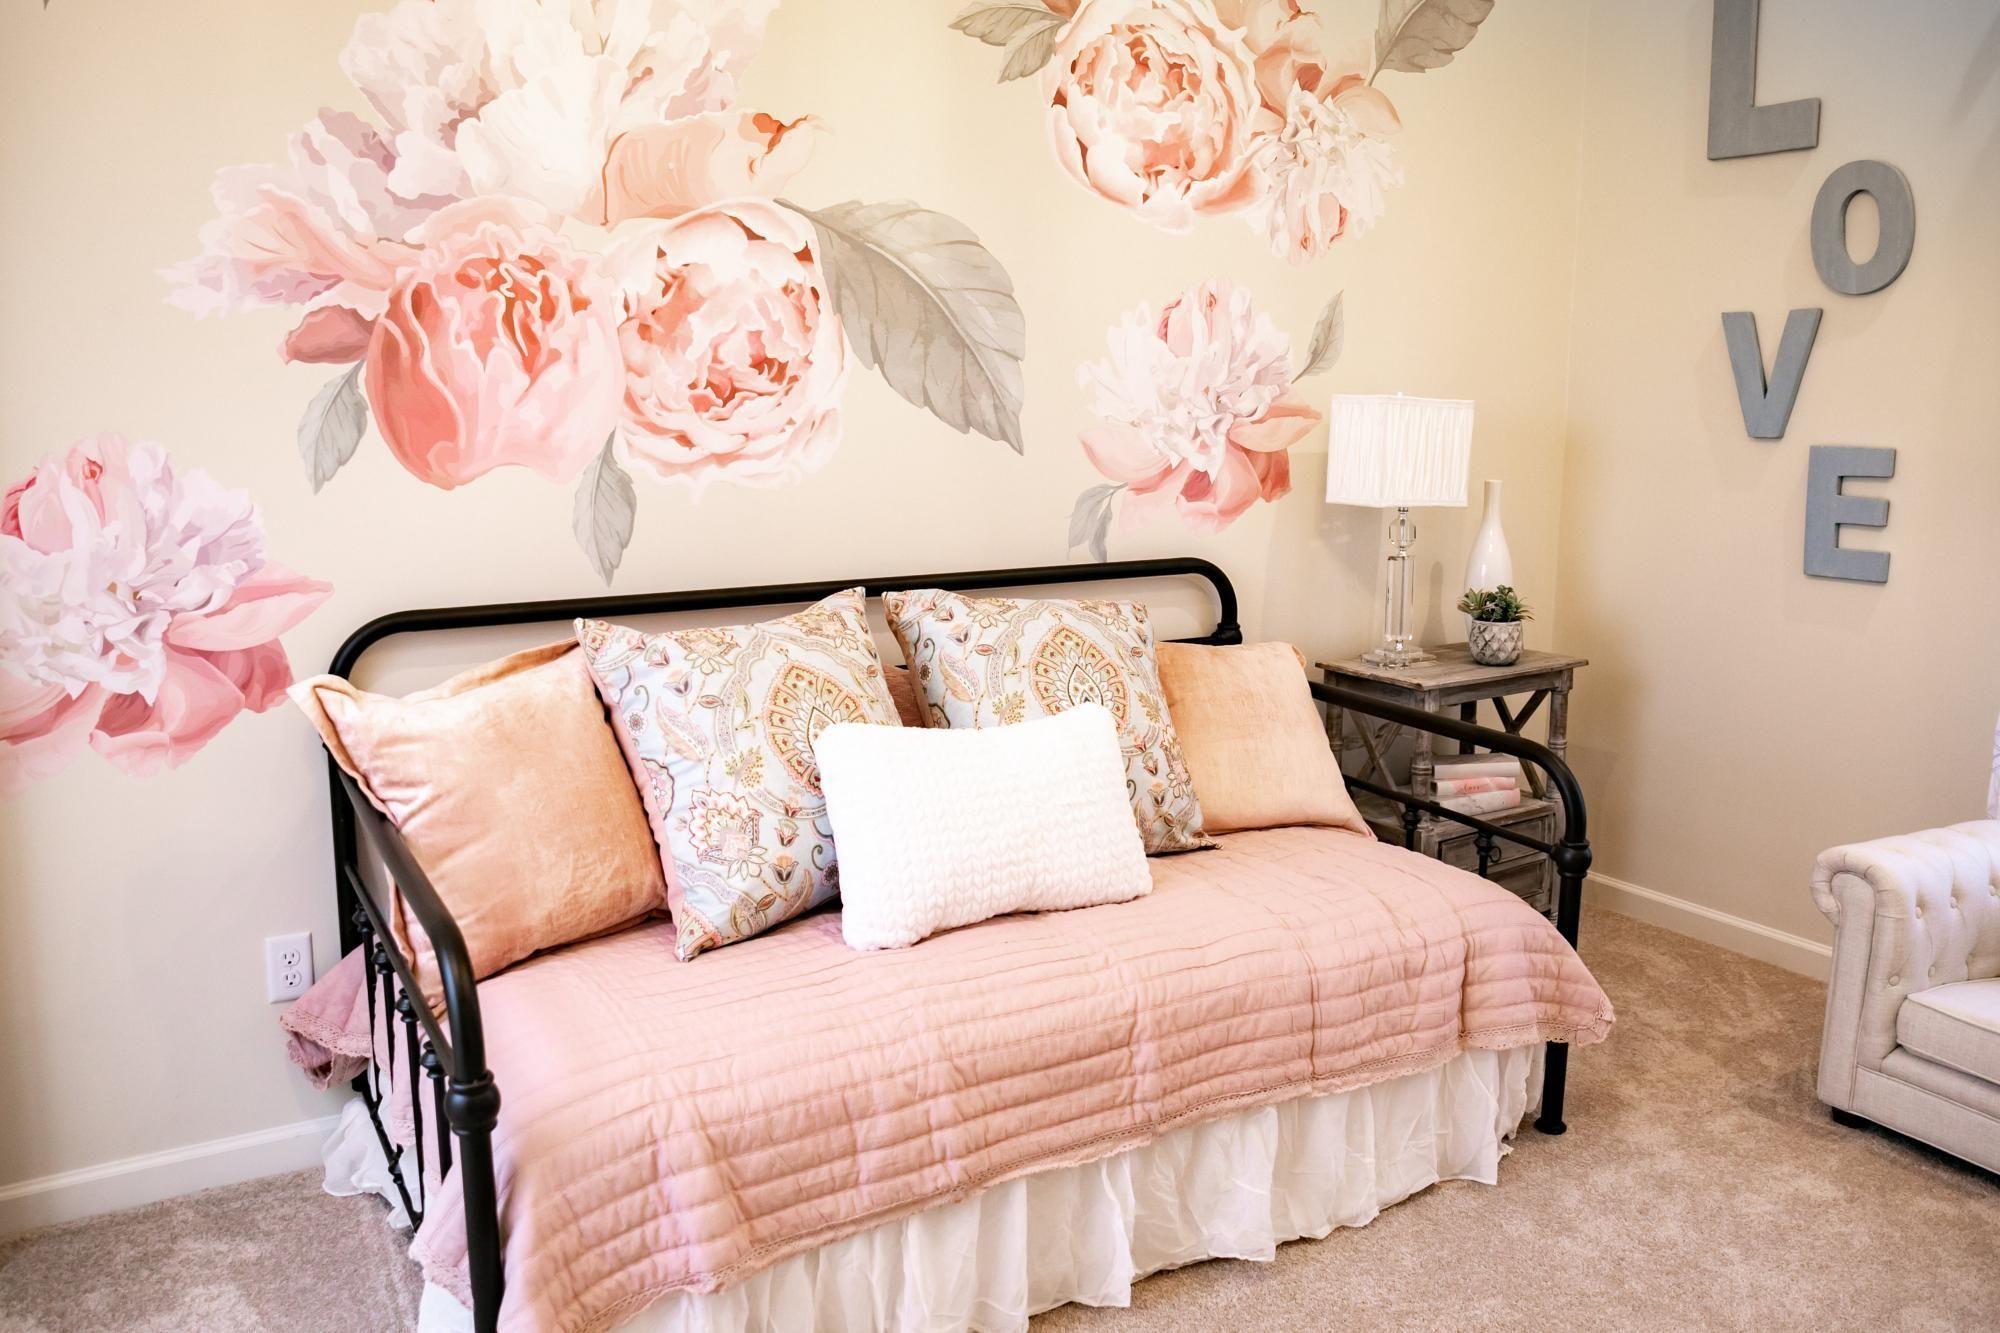 Bedroom featured in the Presley II By Regency Homebuilders in Memphis, TN